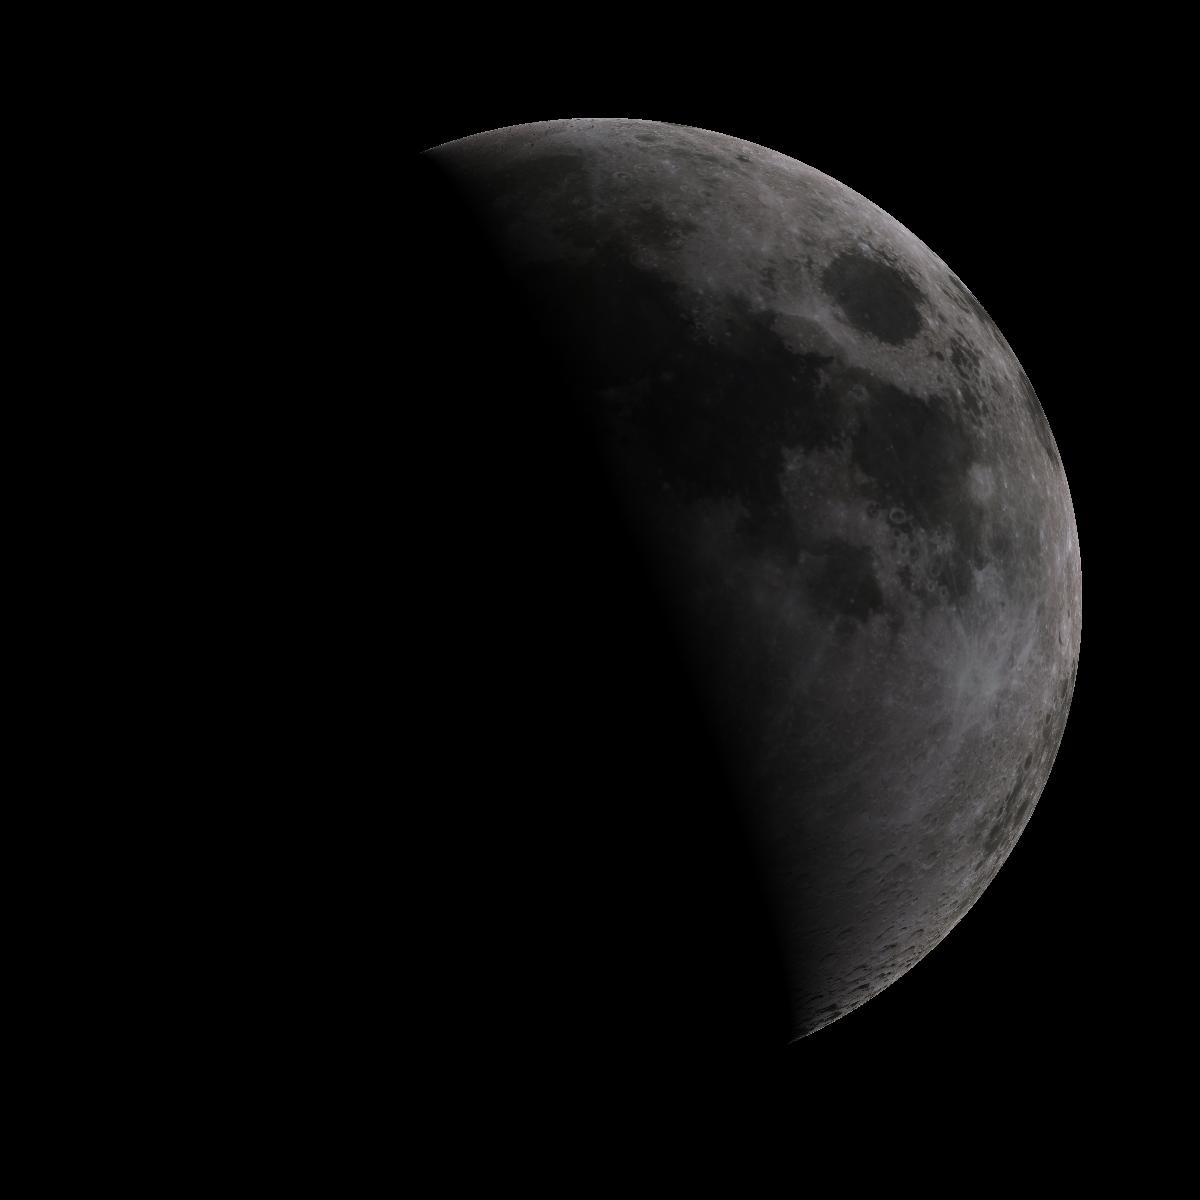 Lune du 9 juillet 2019